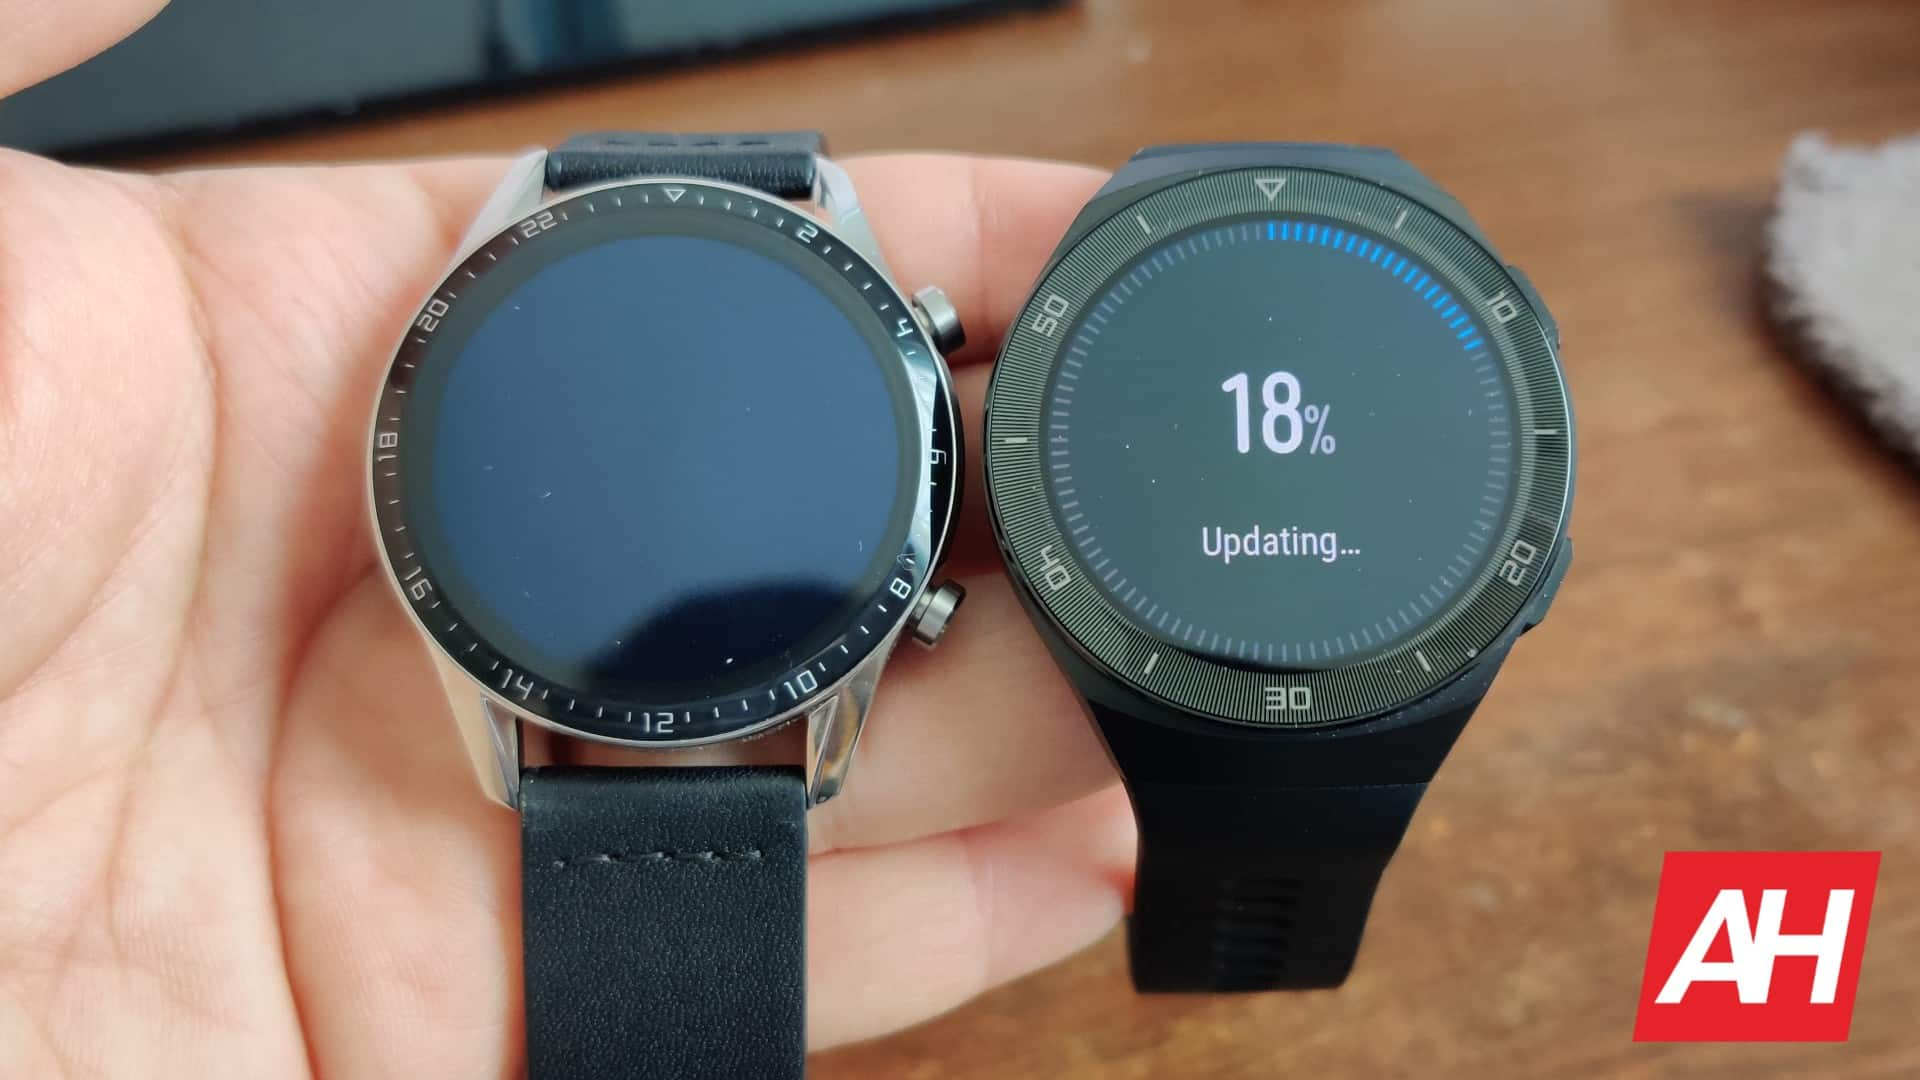 AH Huawei Watch GT 2 vs GT 2e comparison